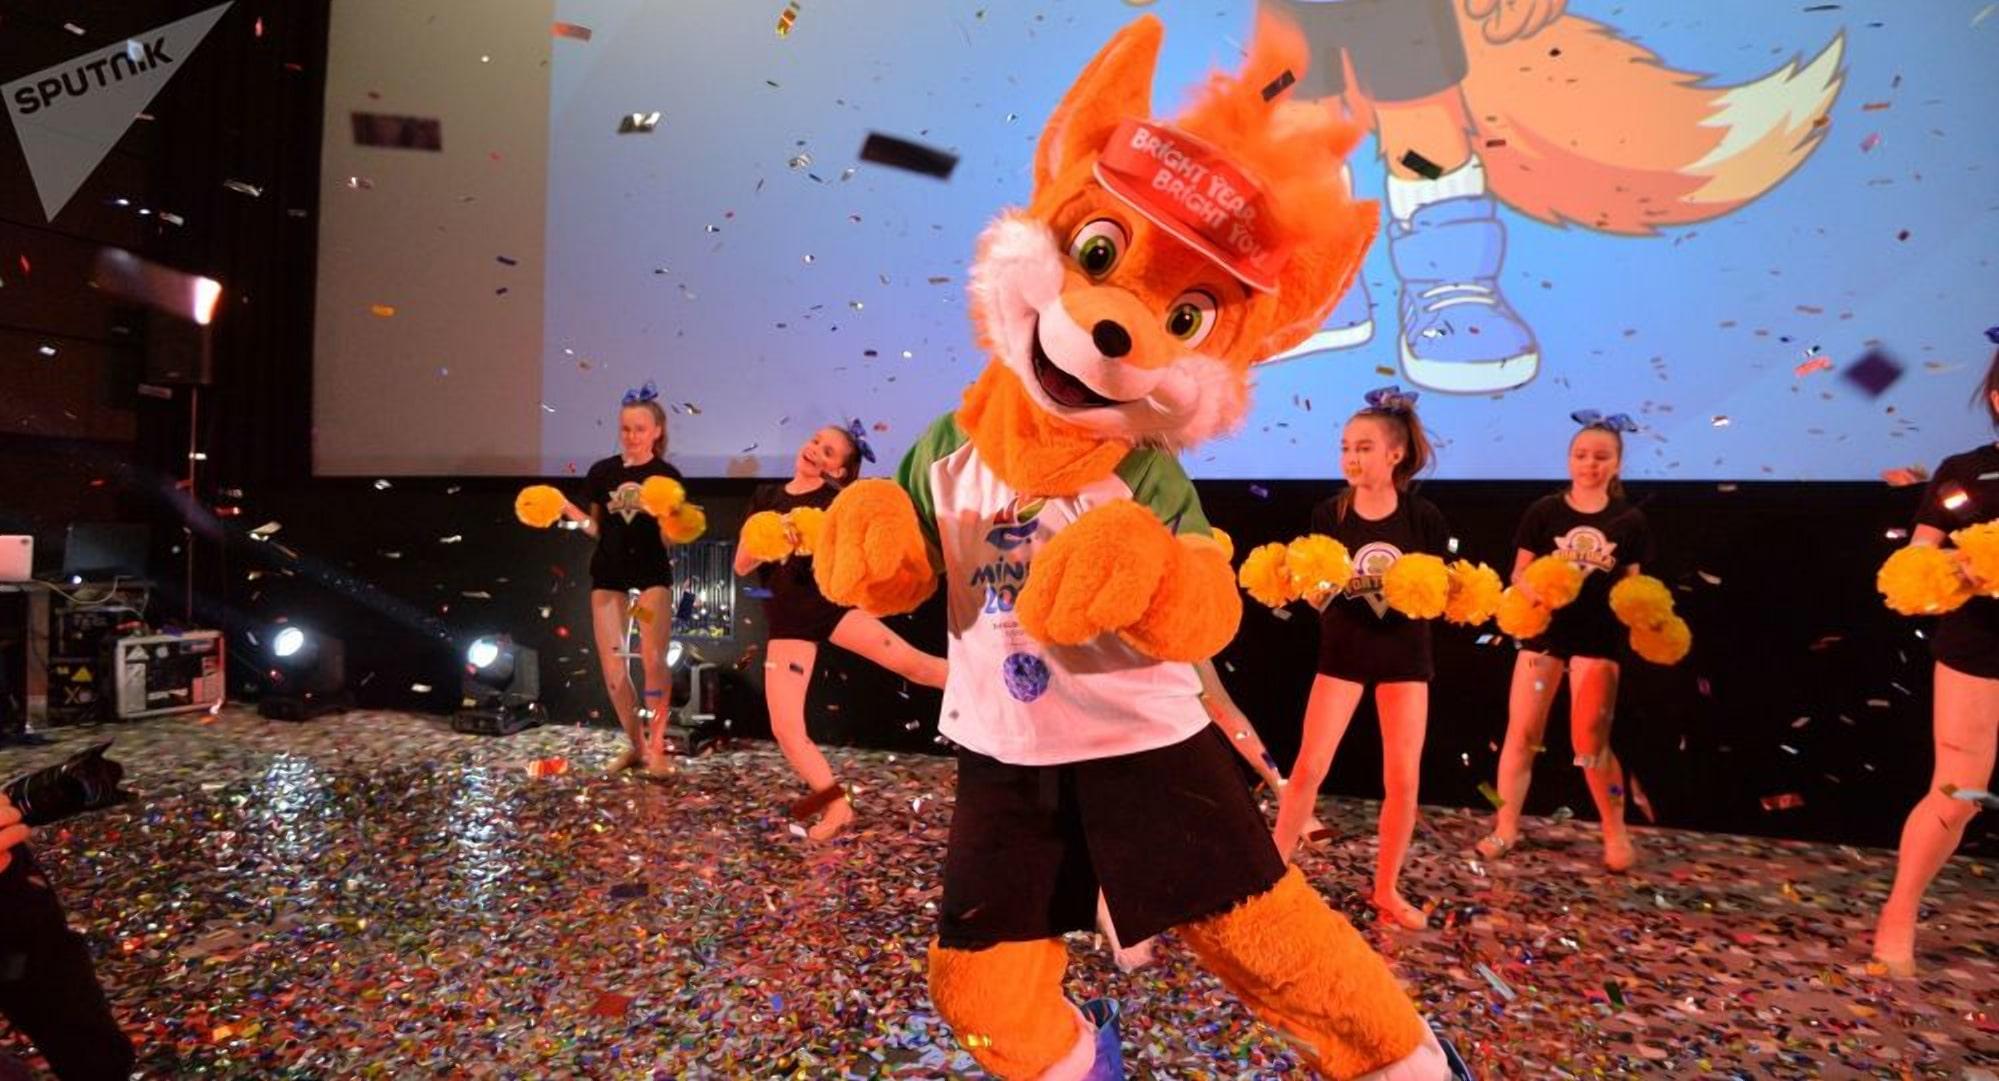 Талисман Евроигр 2019 - лисенок Лесик